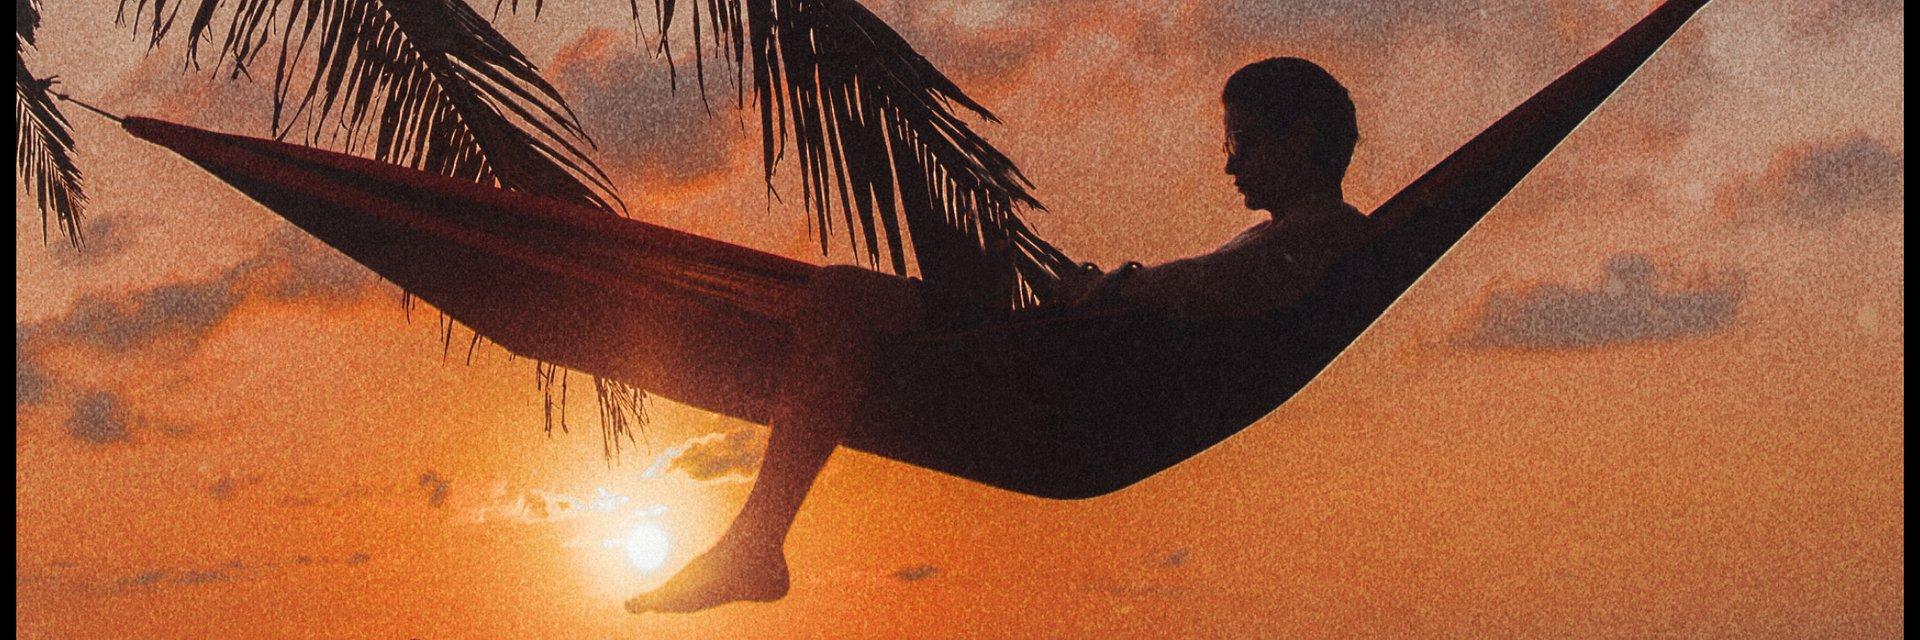 Nowy album Kygo już w ten piątek!